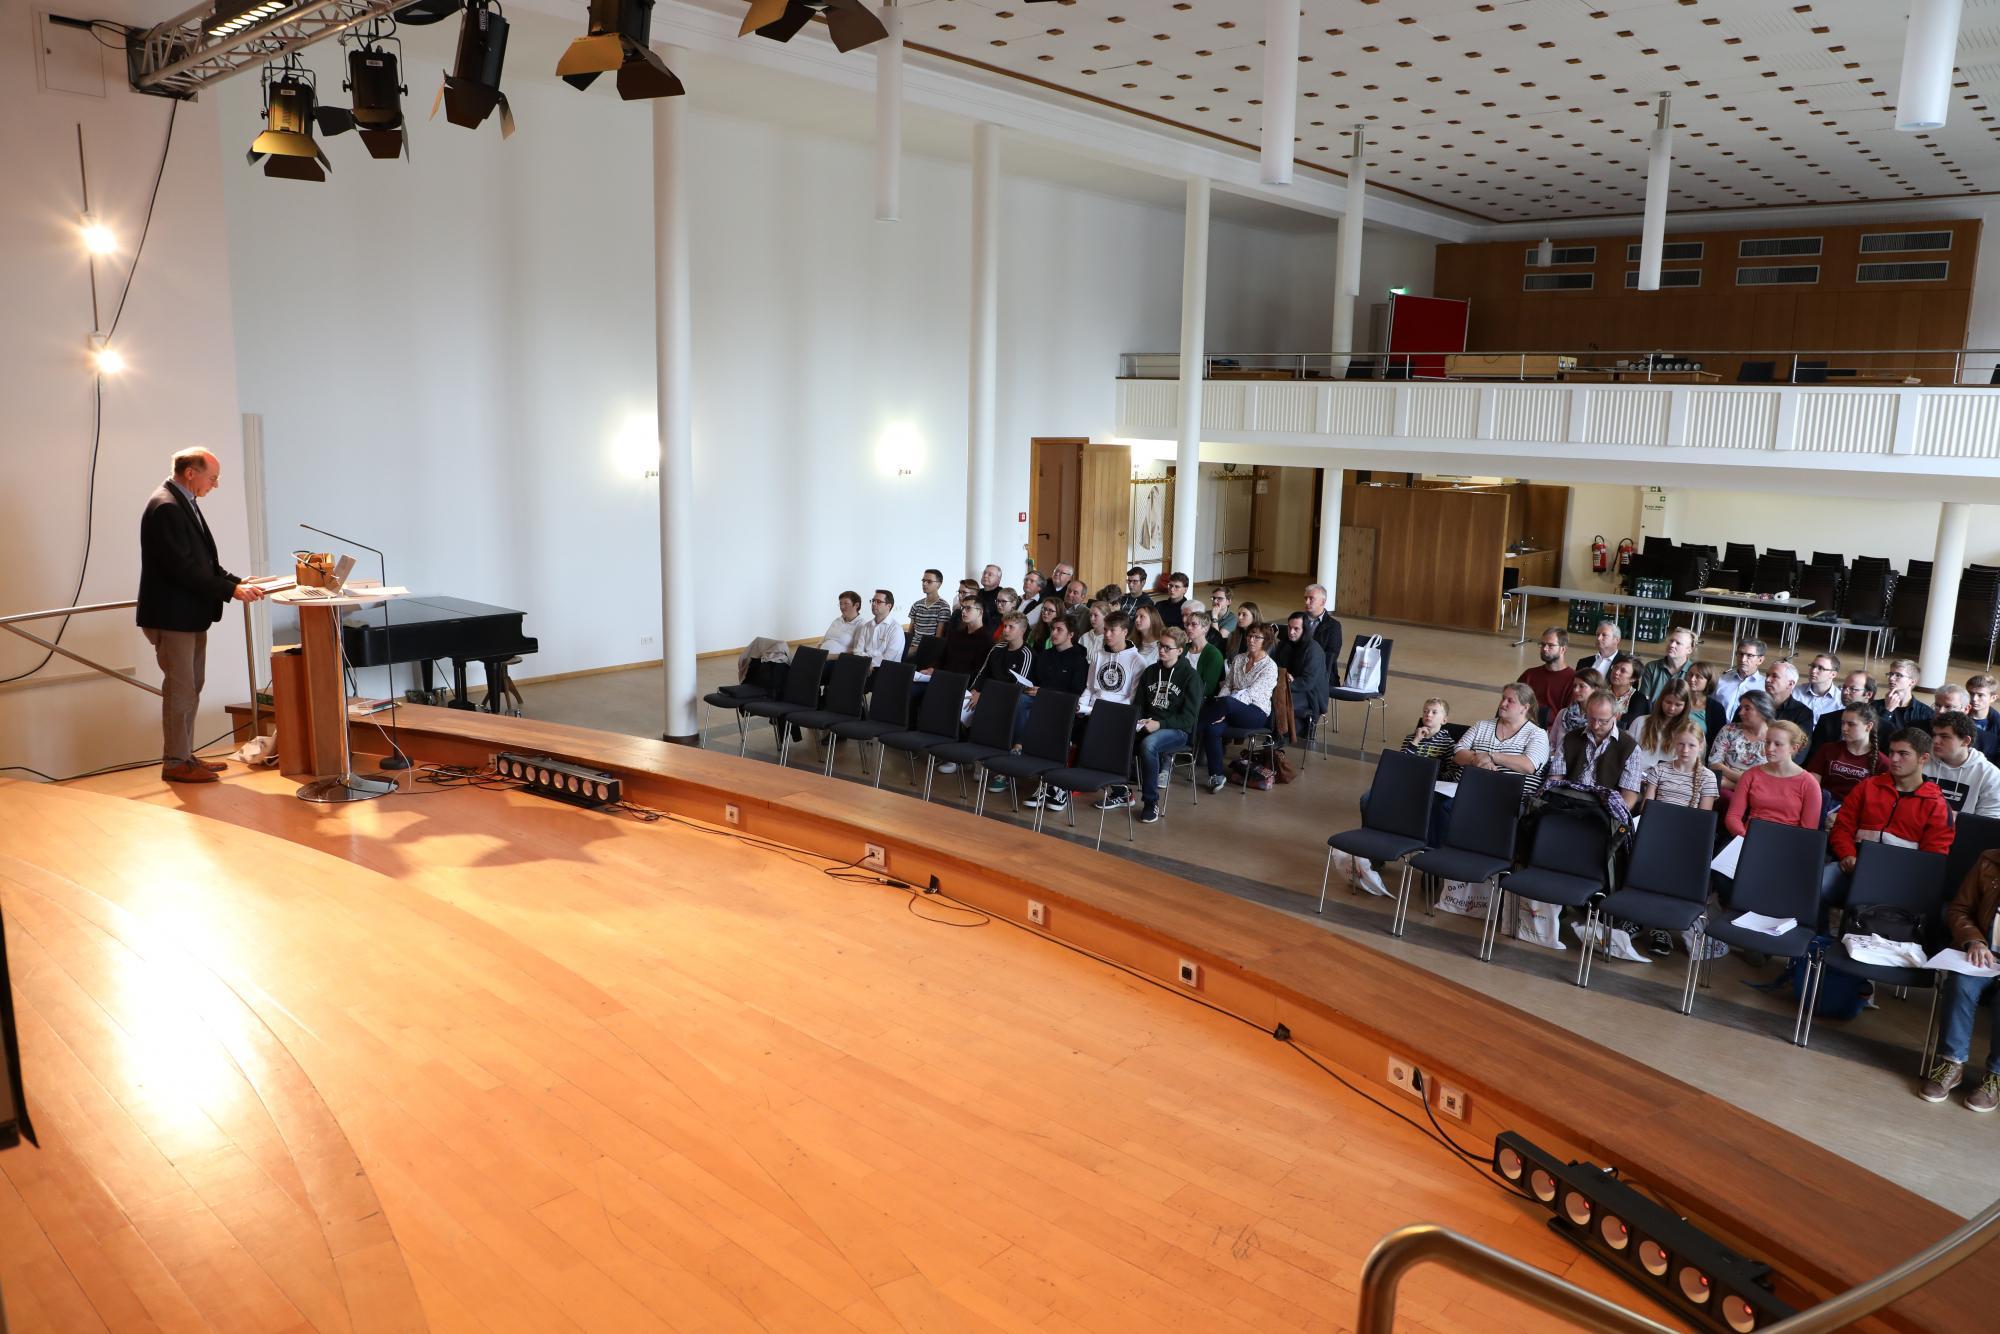 2019_news_Kirchenmusik429A6351